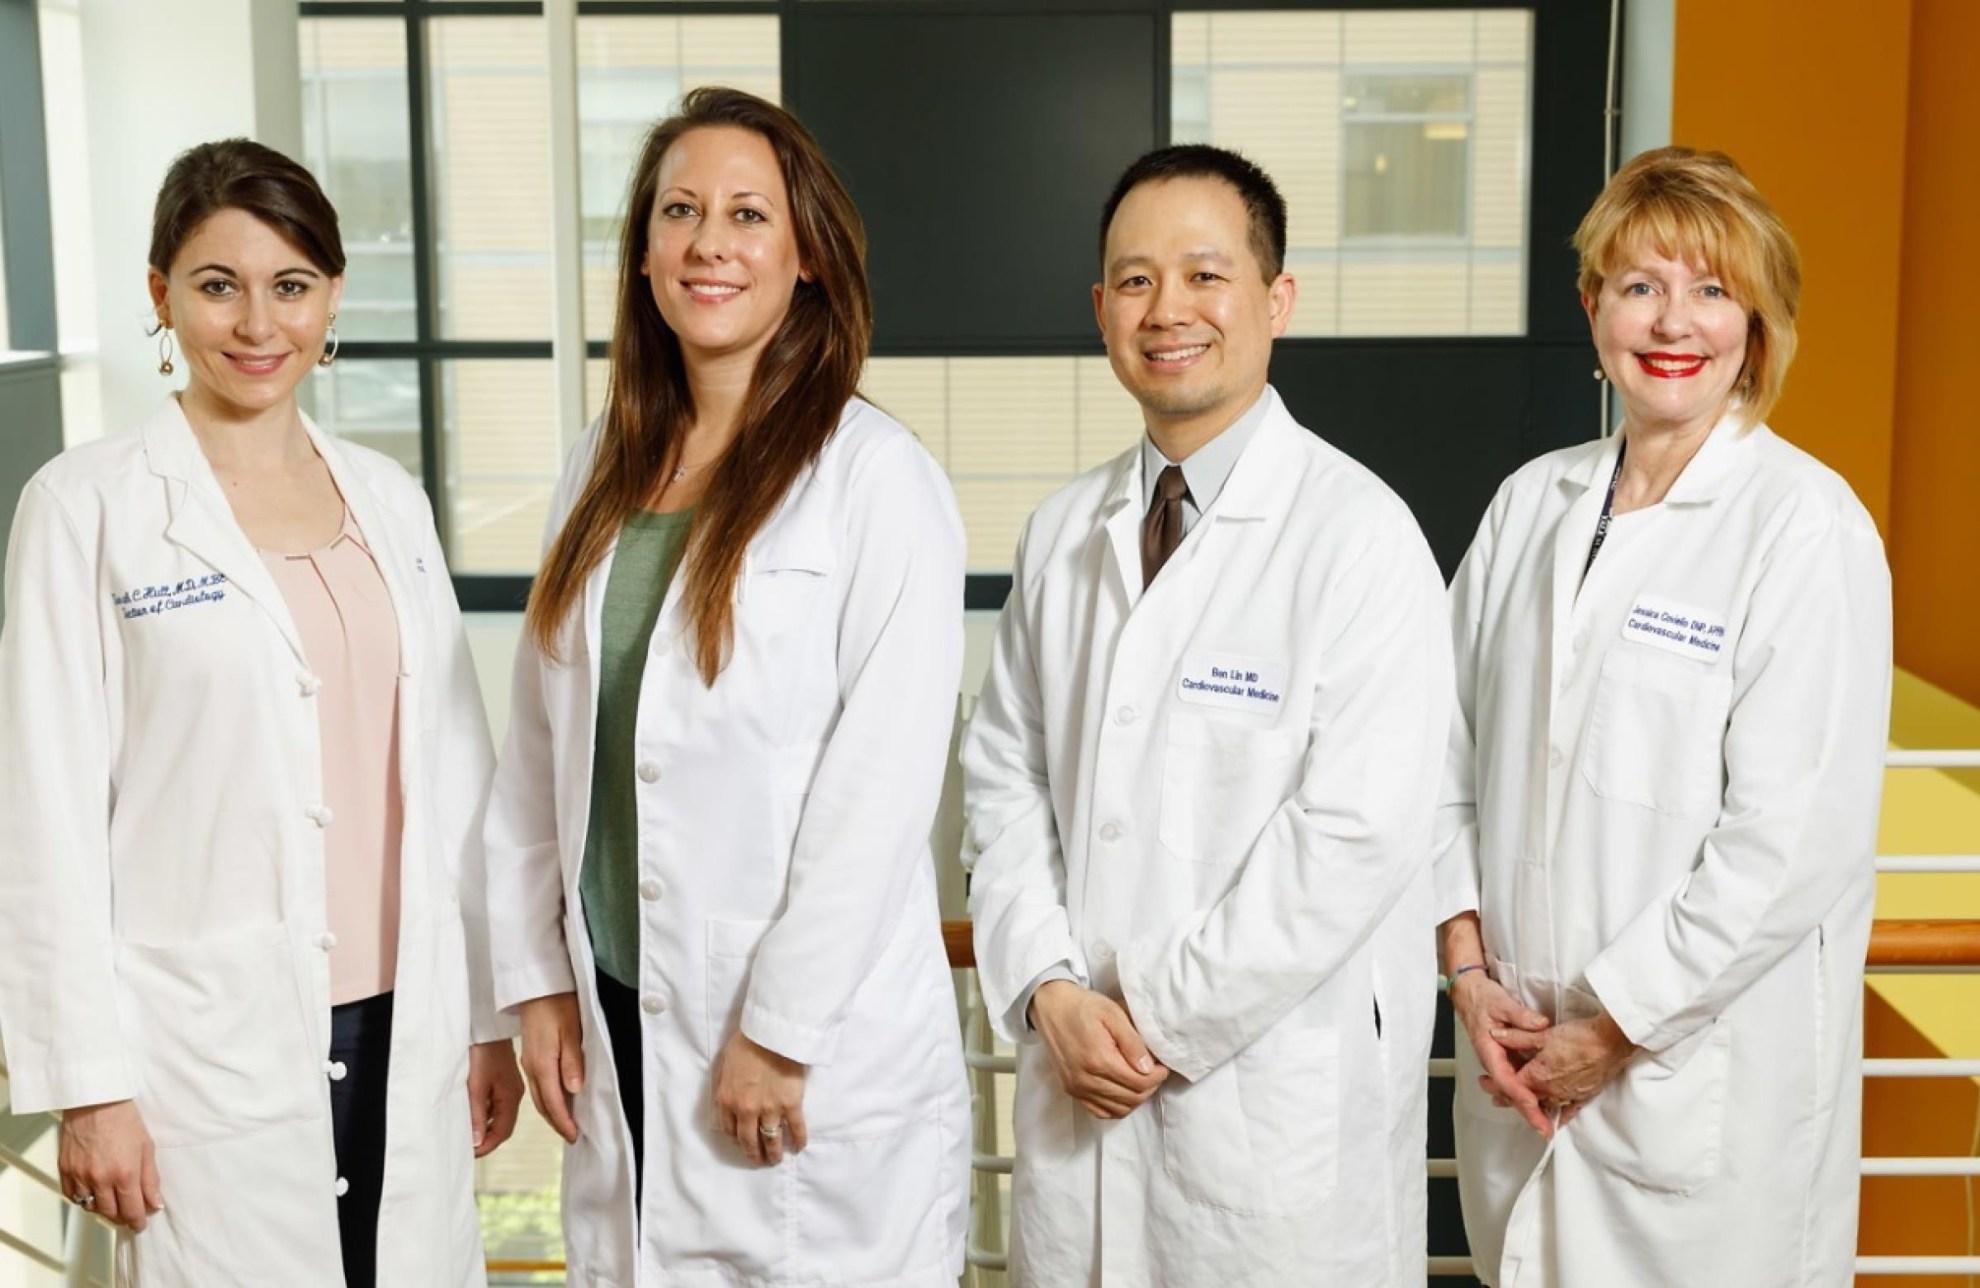 Cardio-Onc team photo